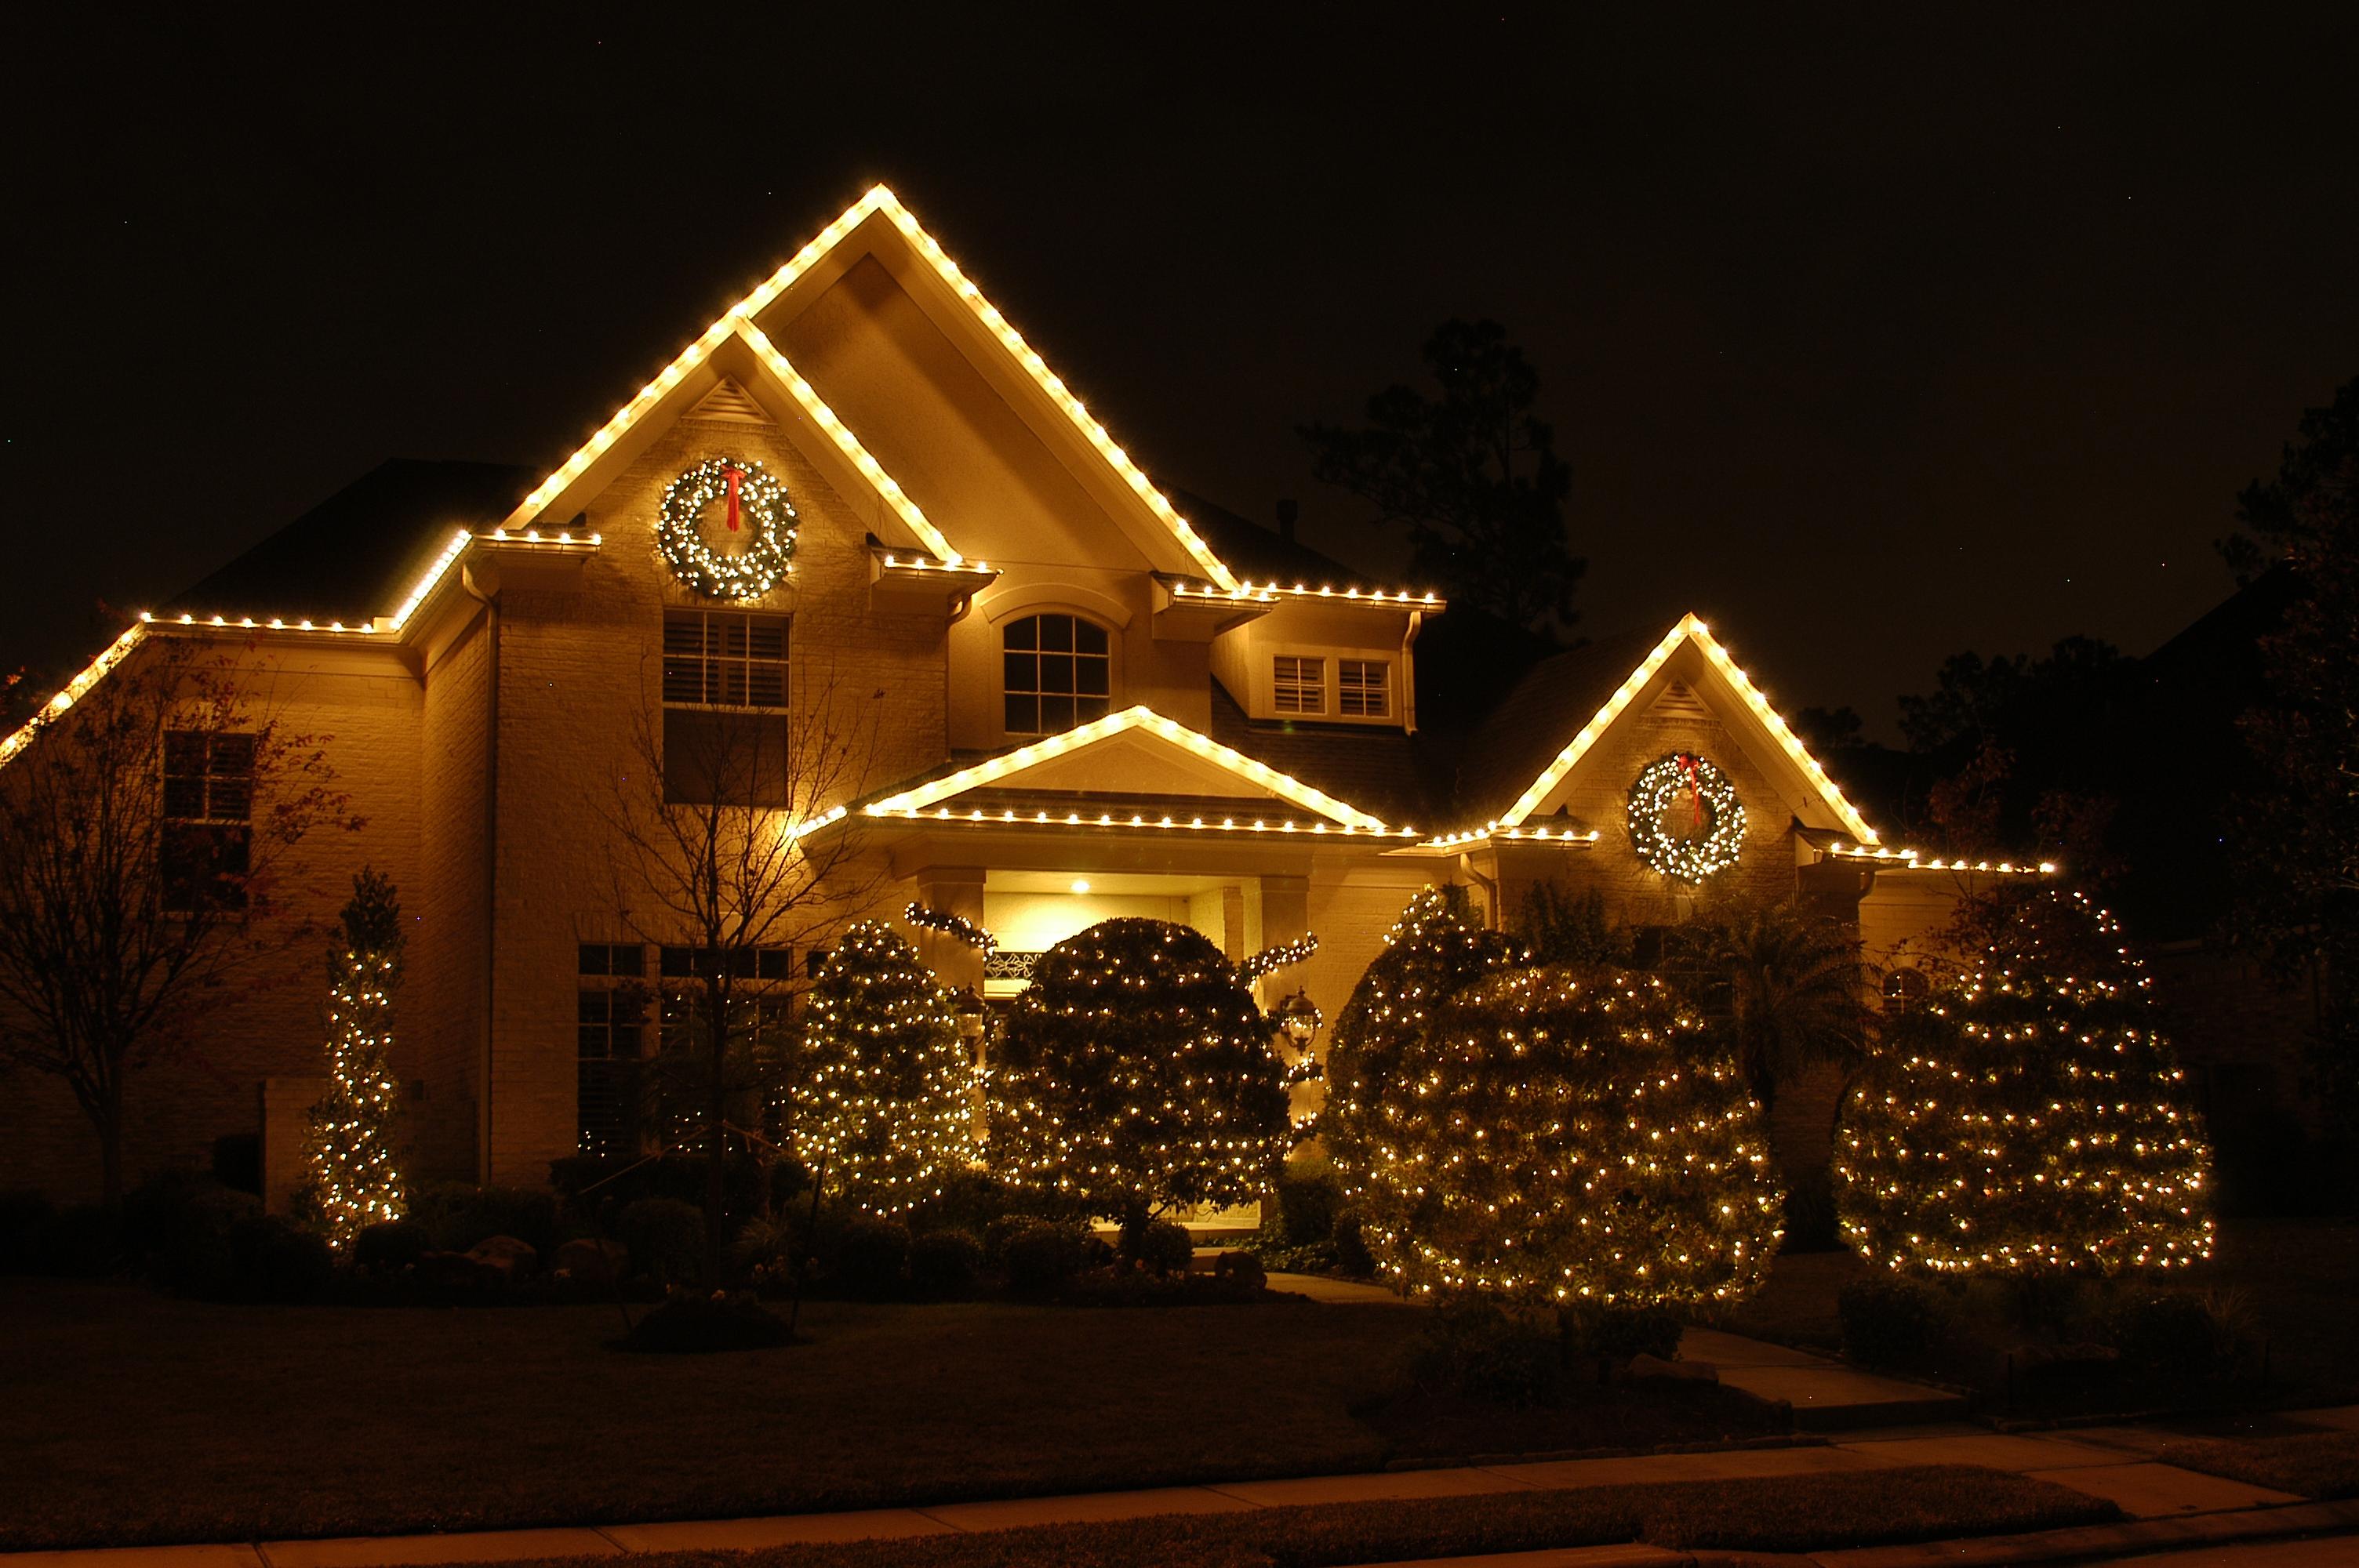 outdoor holiday lighting in richmond - Christmas Outdoor Spotlights